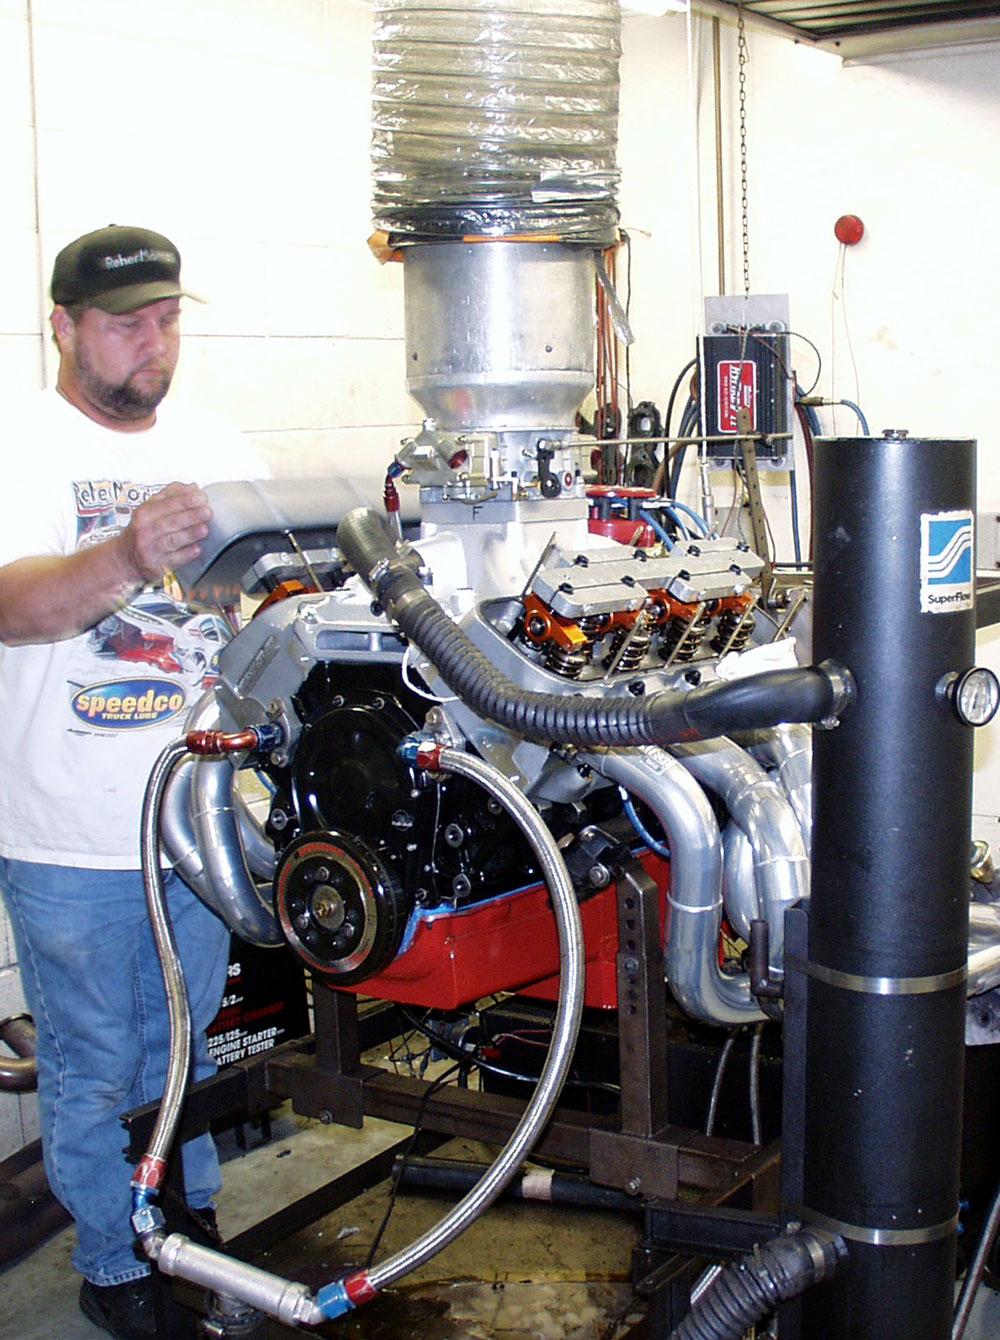 Johnny sets the valves on dyno engine